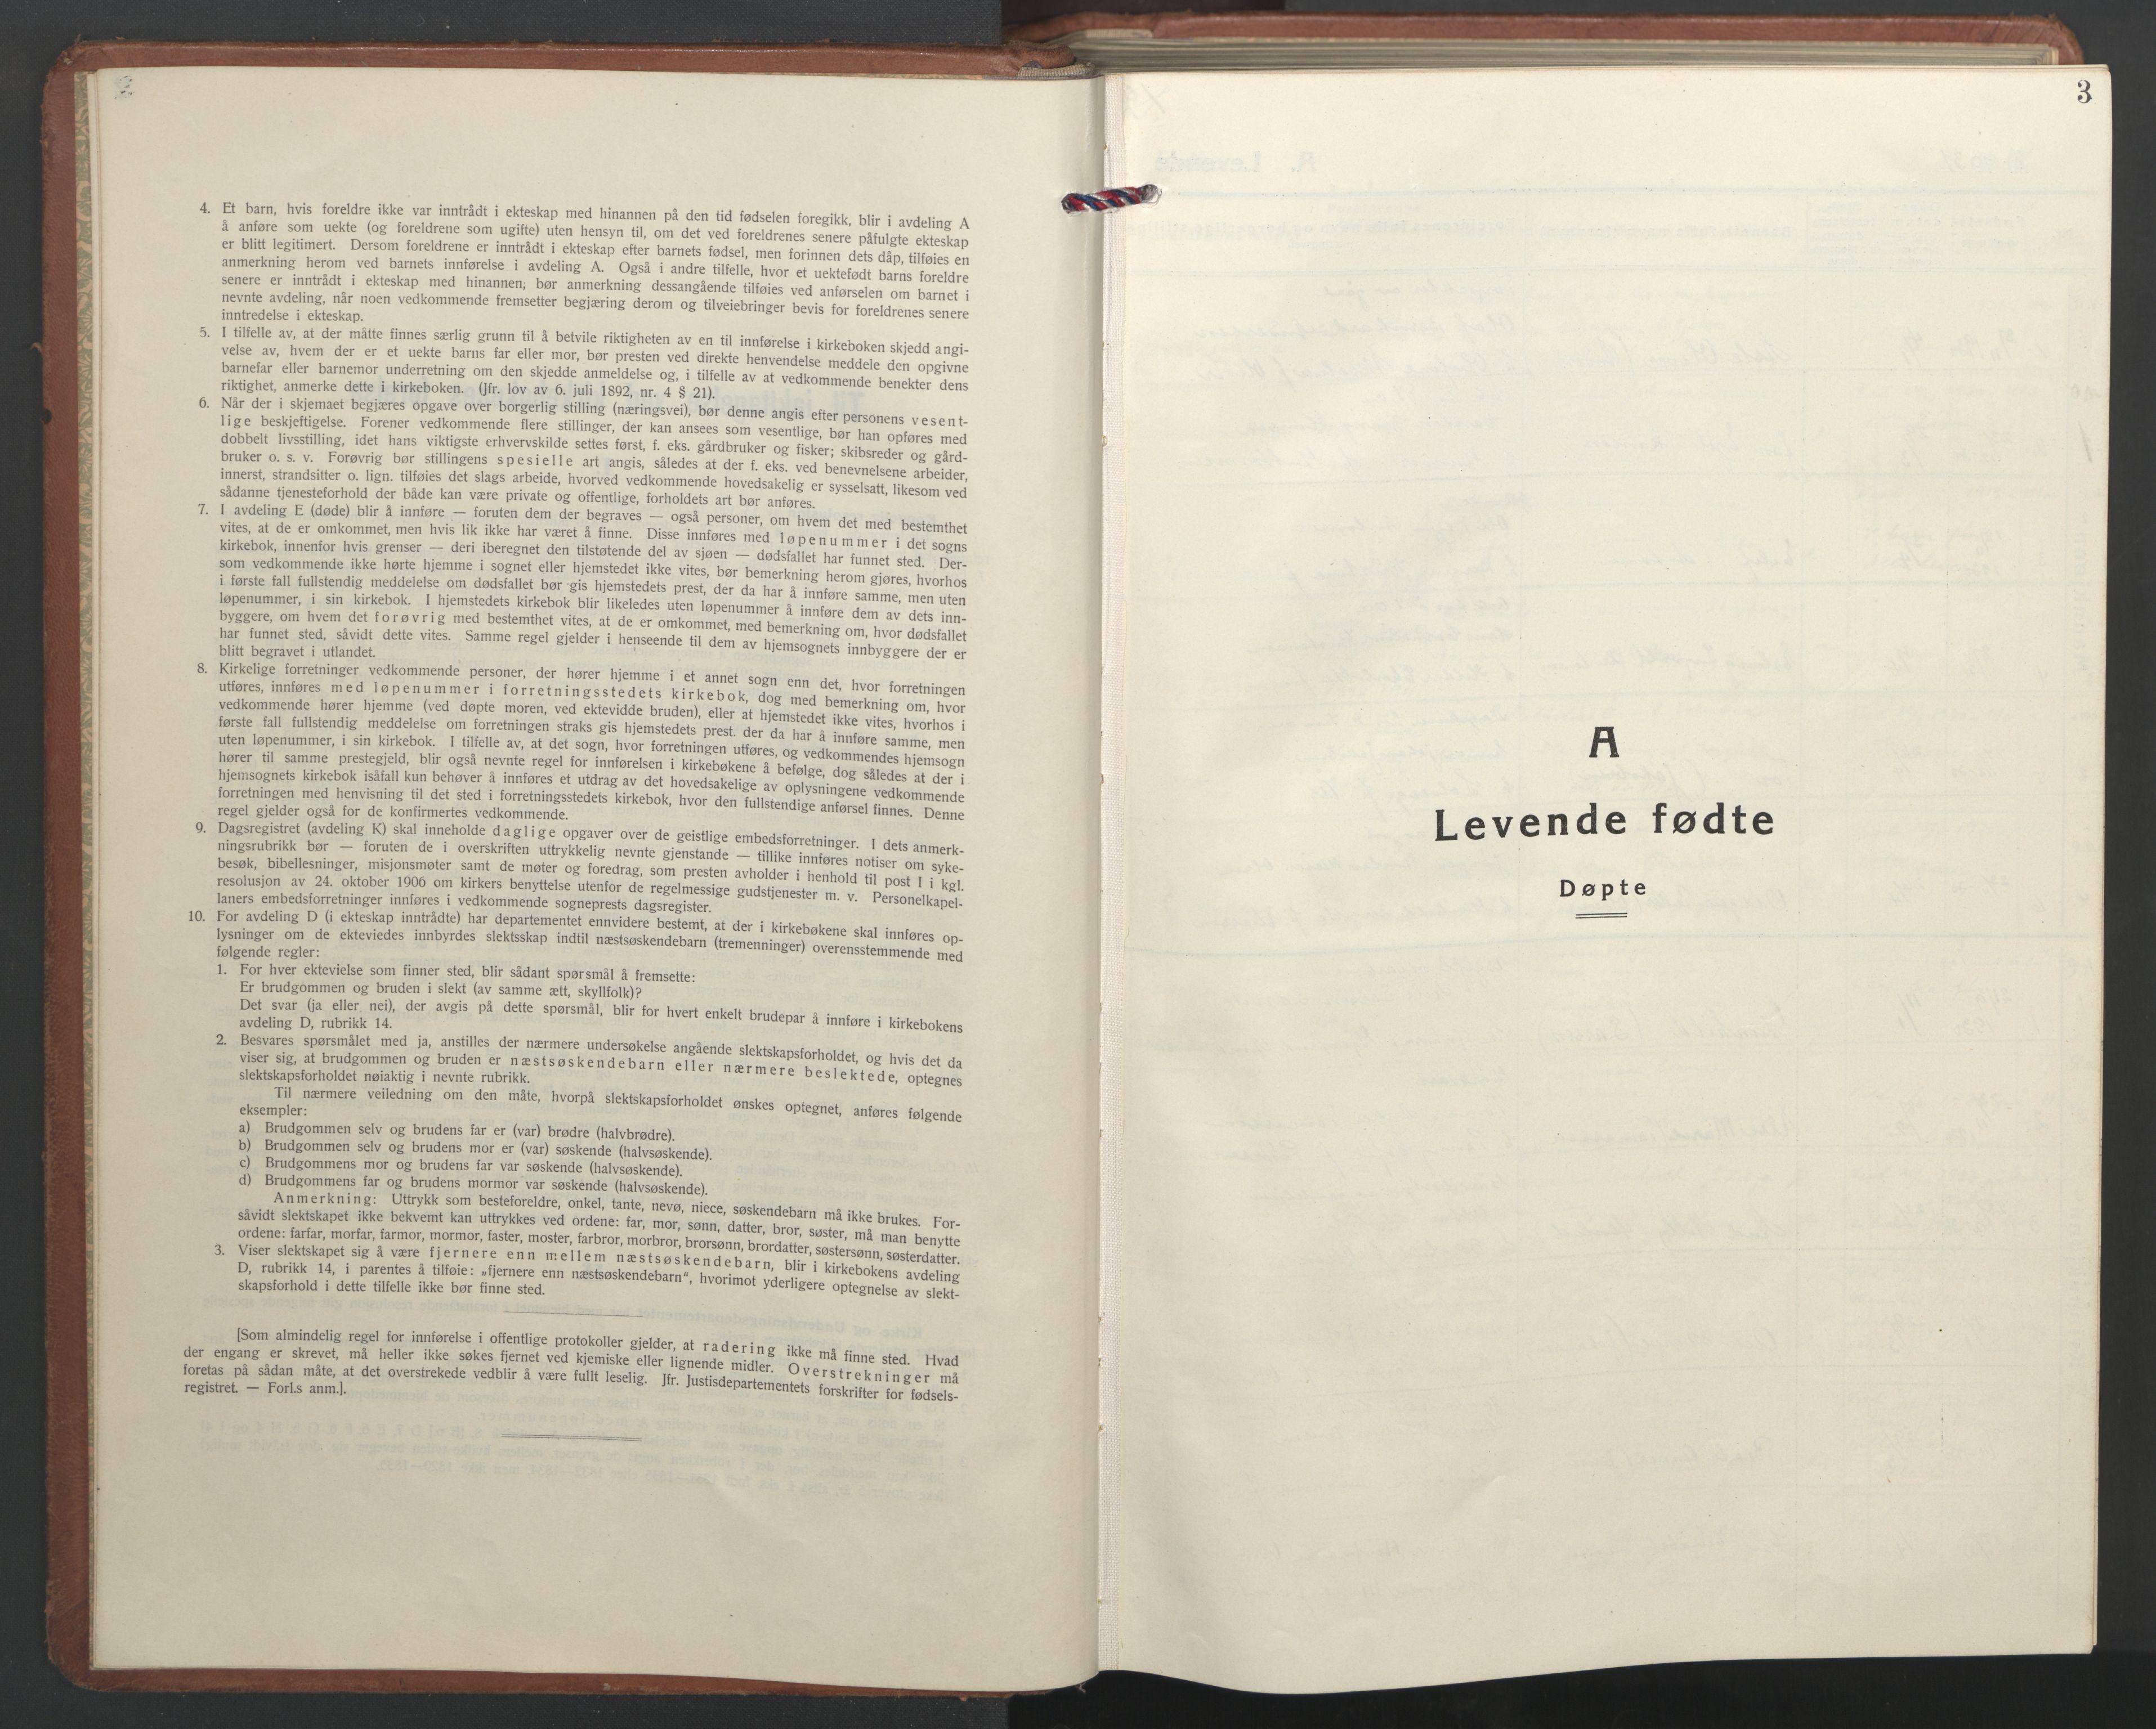 SAT, Ministerialprotokoller, klokkerbøker og fødselsregistre - Nordland, 827/L0425: Klokkerbok nr. 827C14, 1931-1946, s. 3